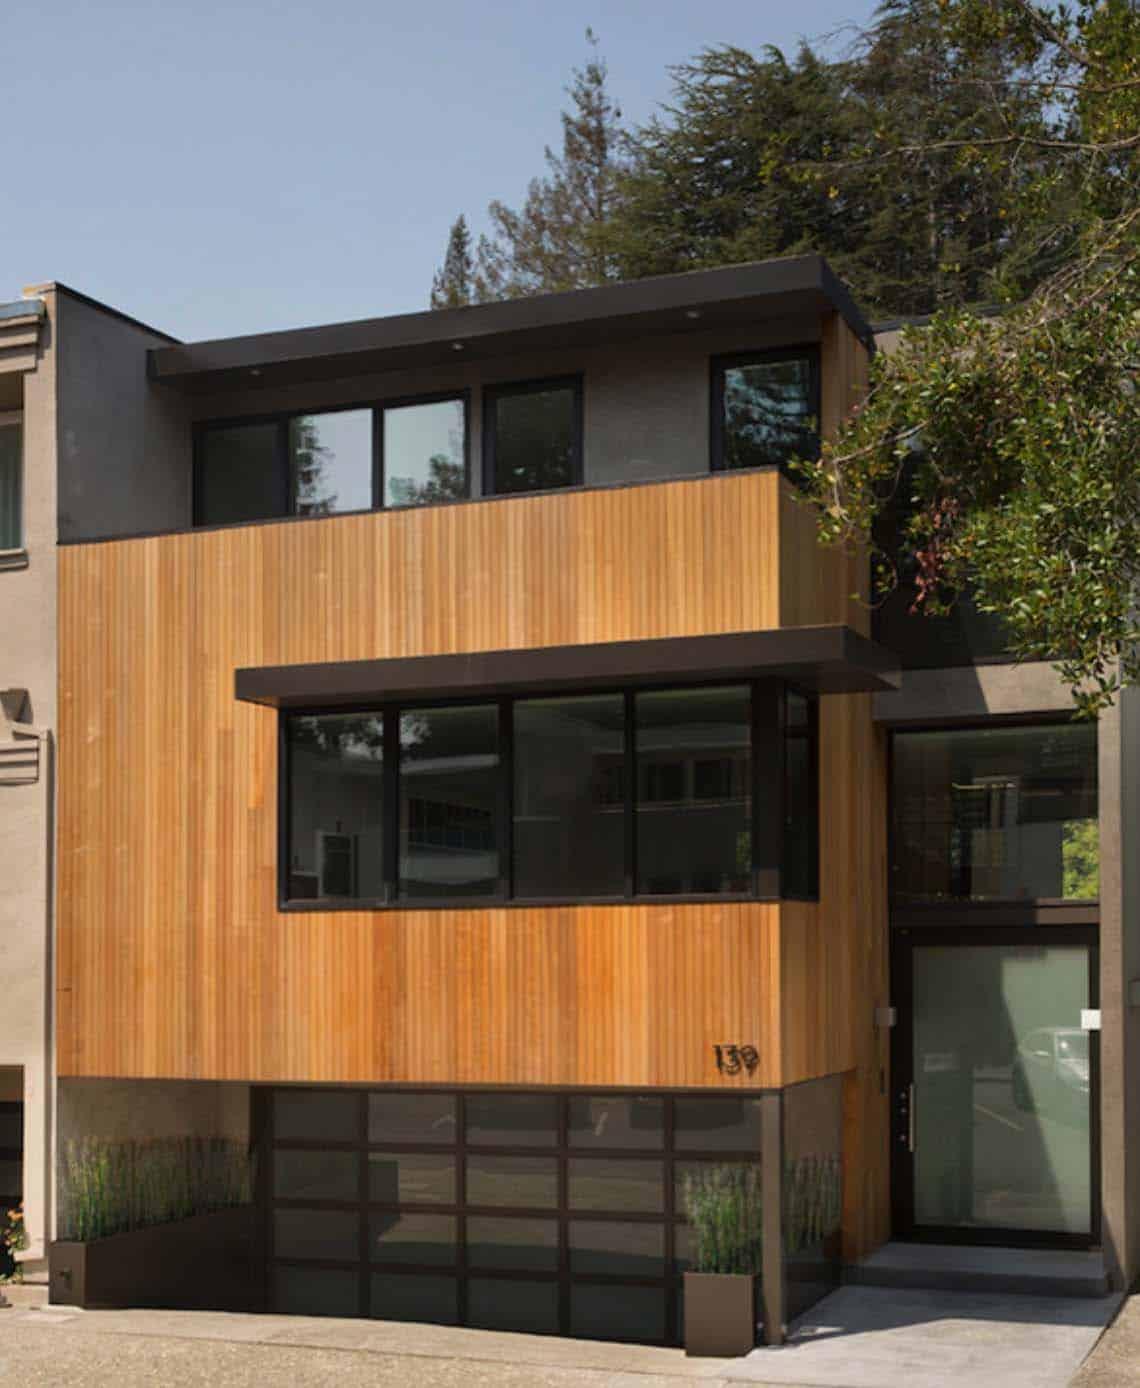 Eichler-Inspired Townhouse-John Lum Architecture-01-1 Kindesign